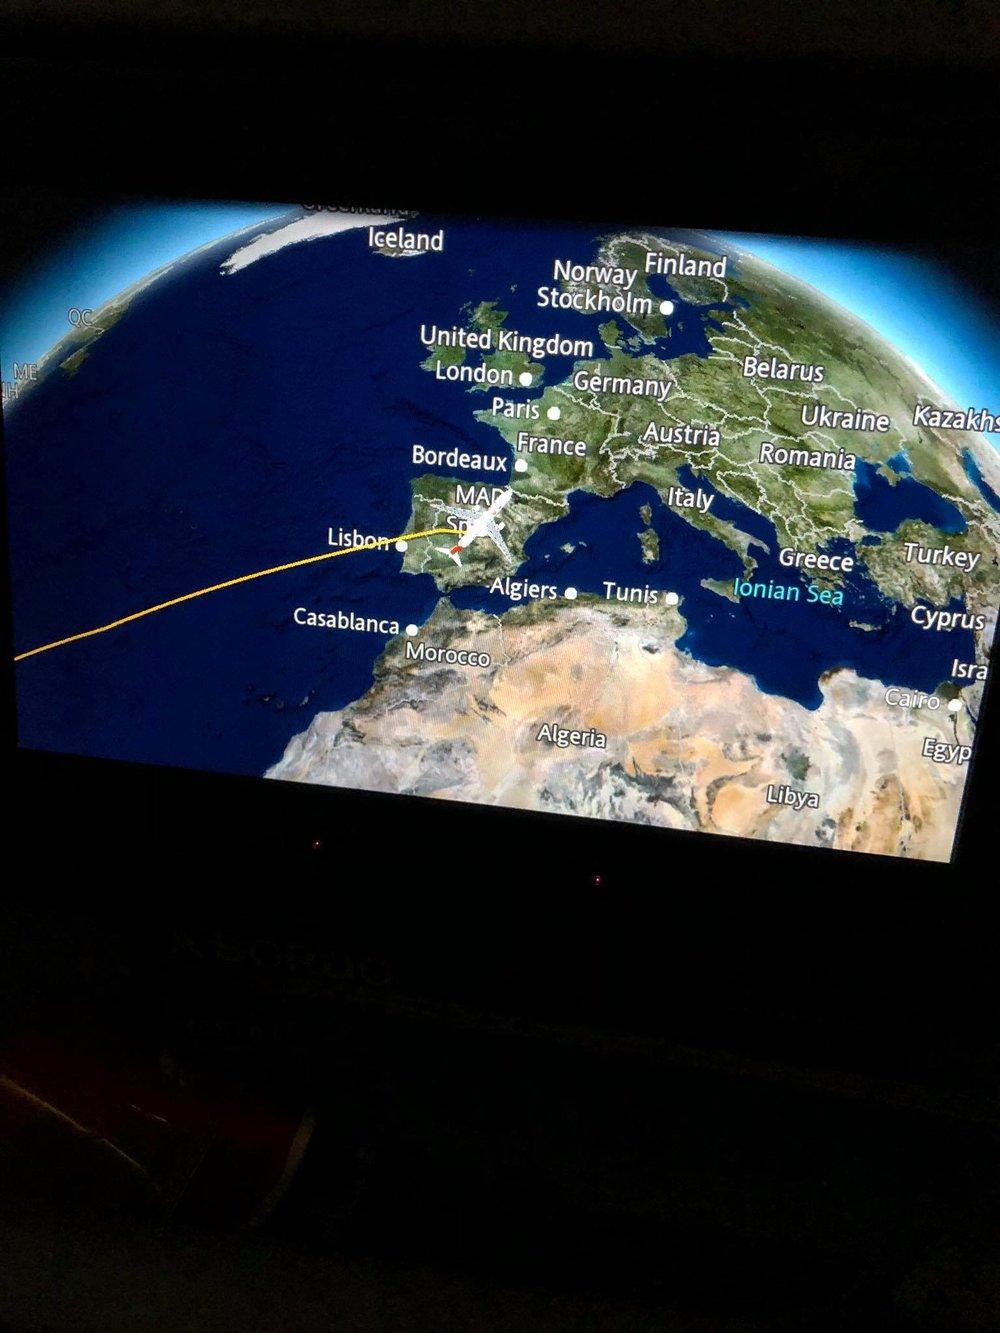 Kach Solo Travels in 2019 Hello from Madrid, Spain2.jpg